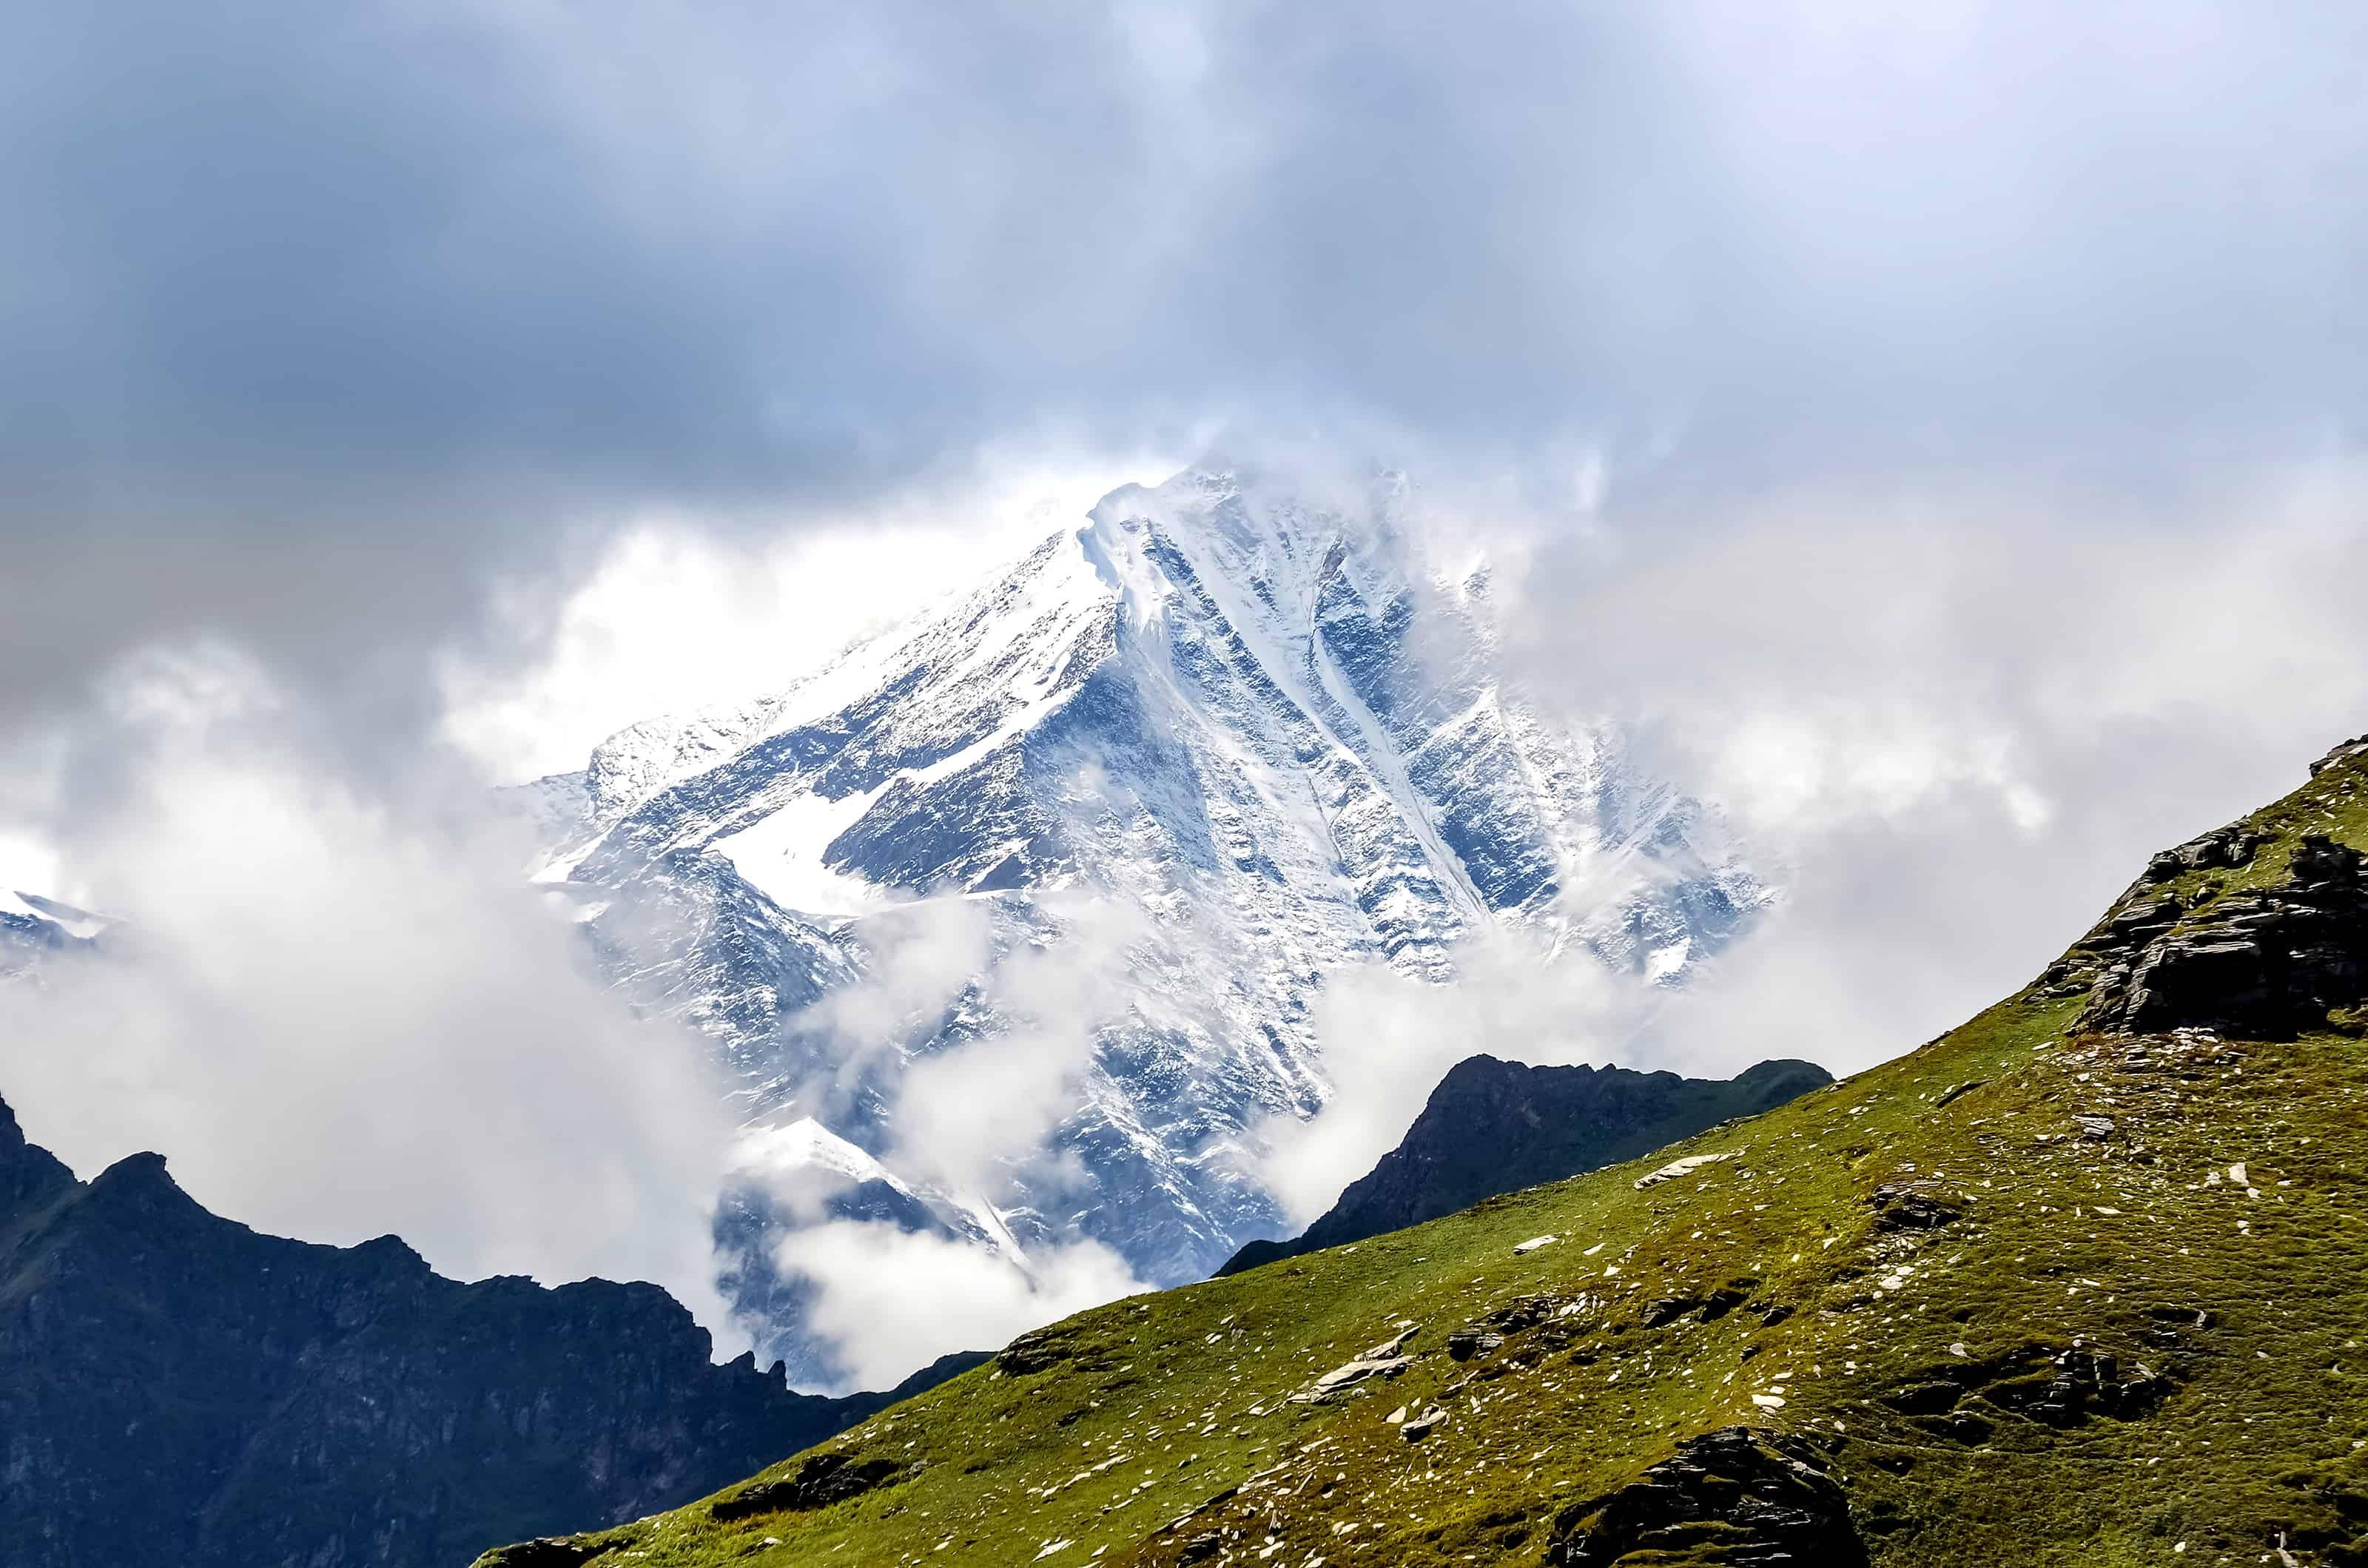 Himachal Pradesh Snowfall